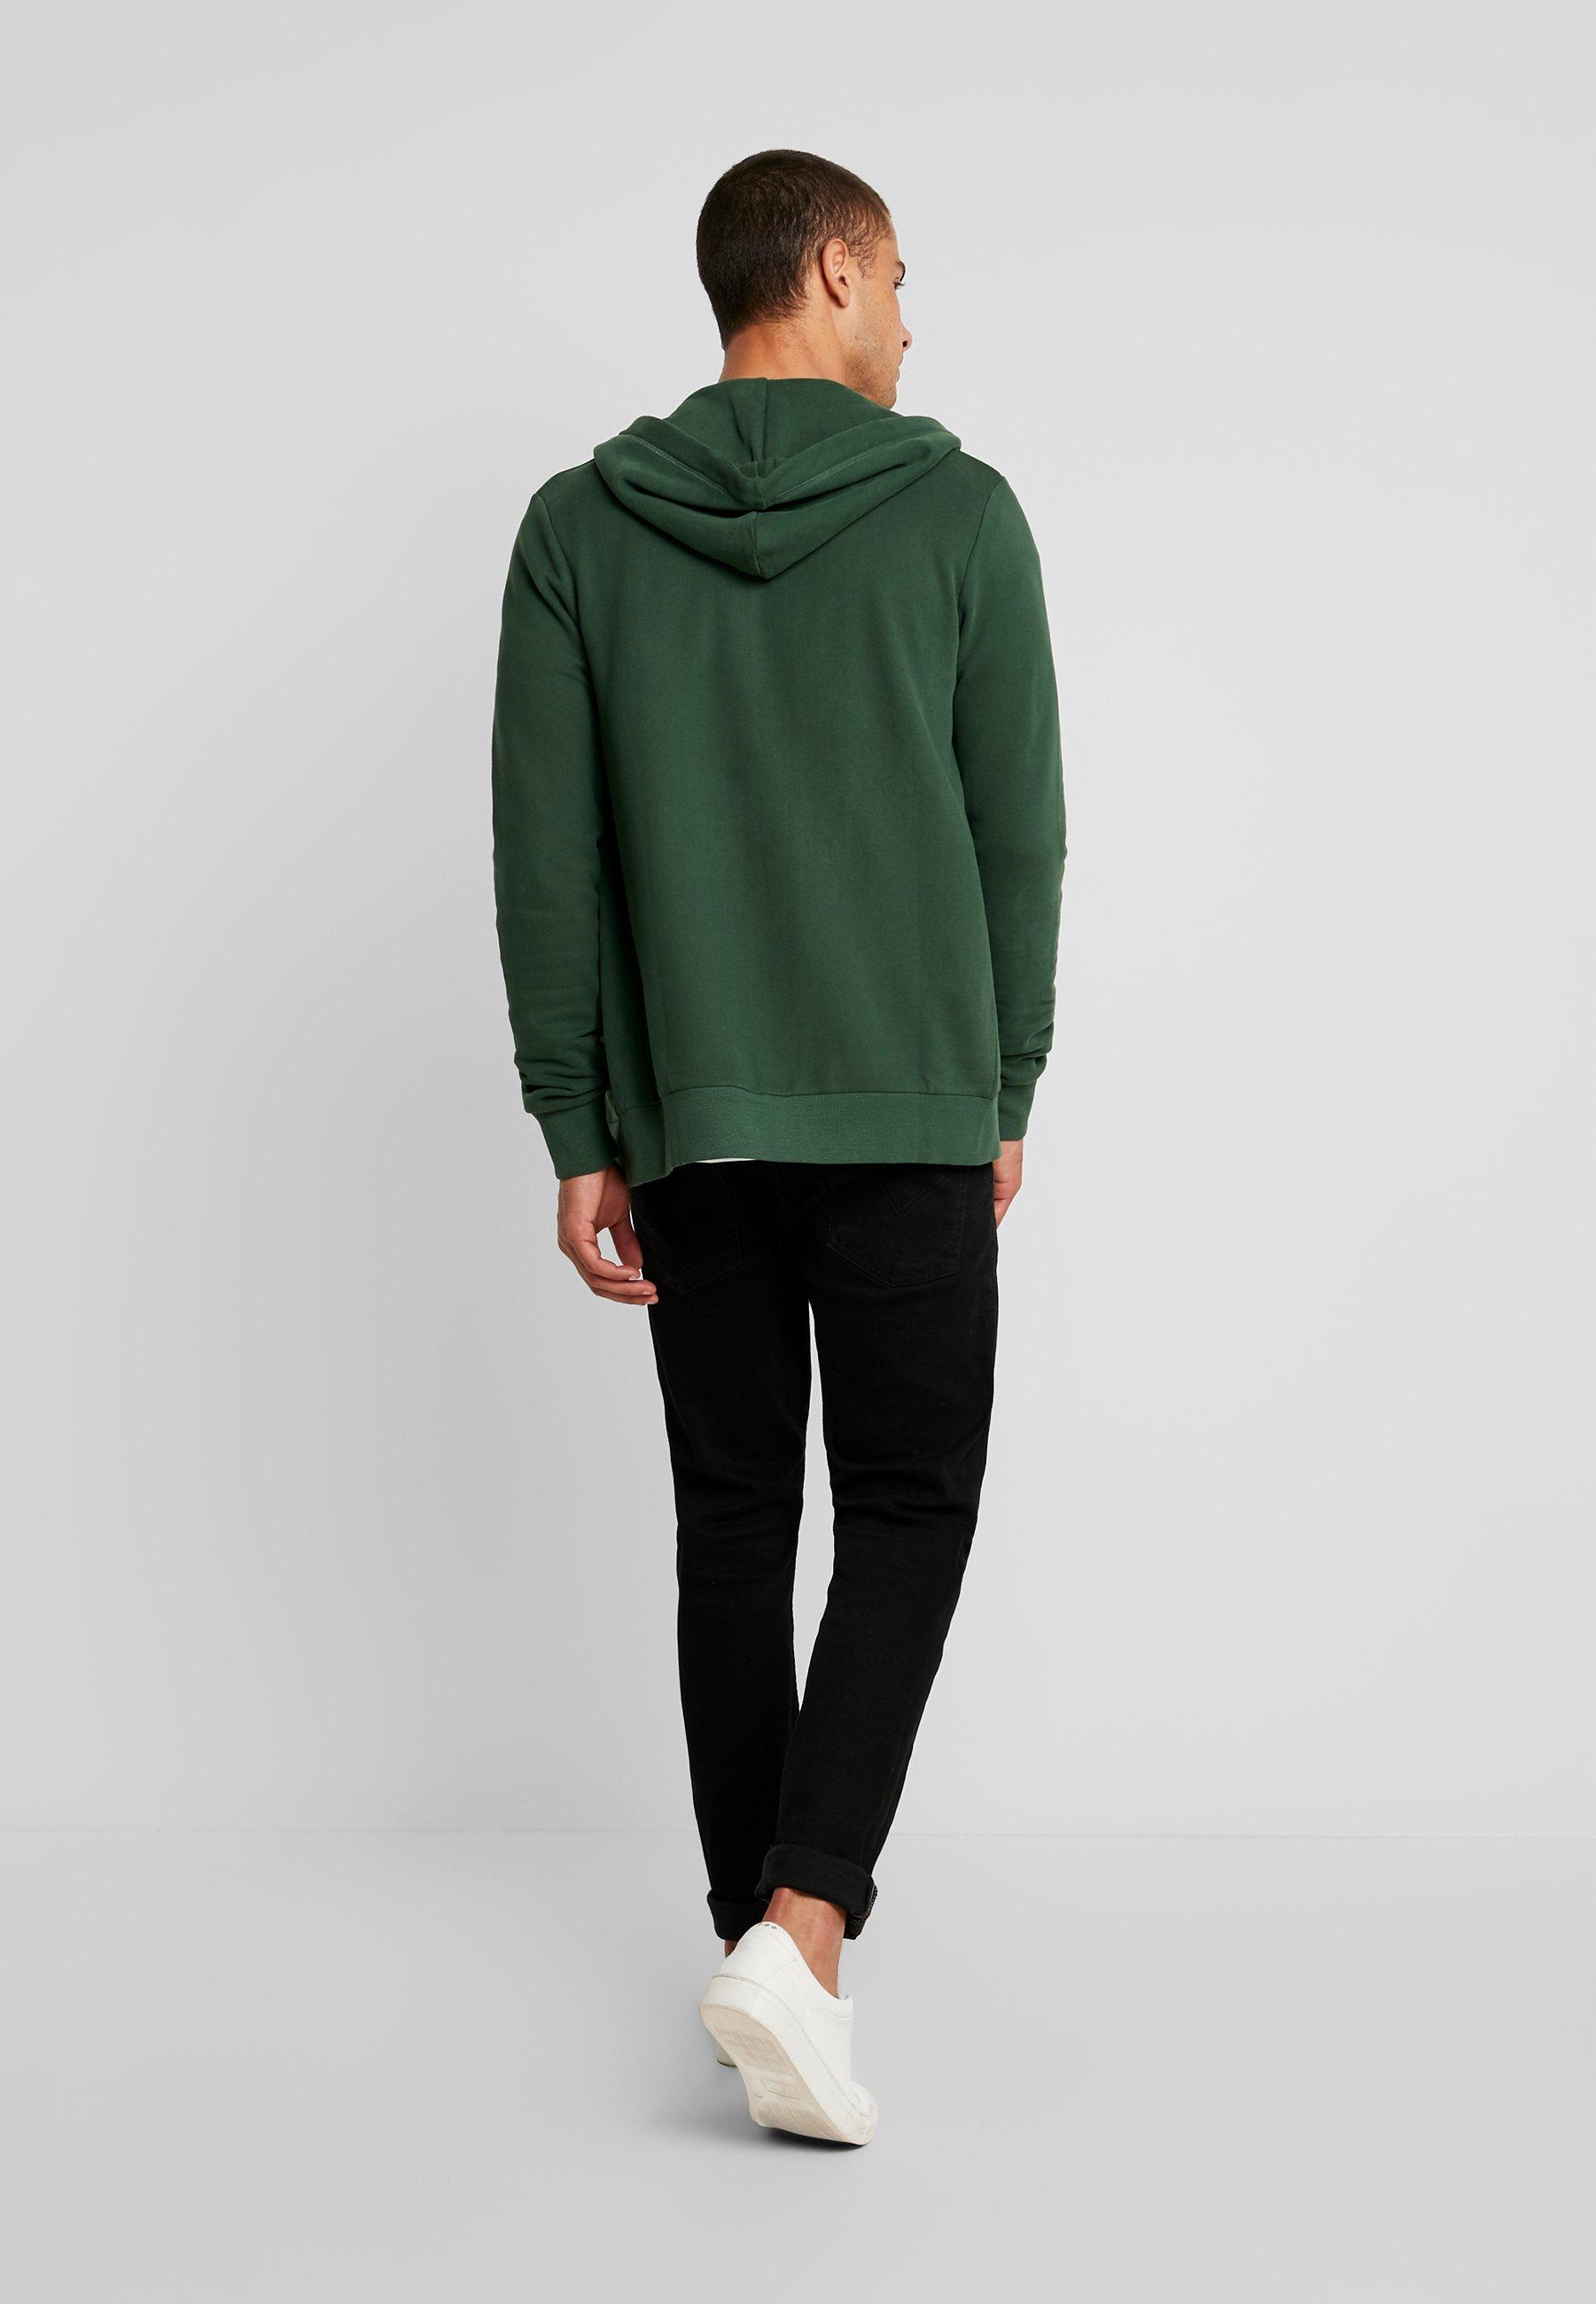 Veste En Tailor Green Denim Sweat ZippéePineneedle Tom dQrCxoeWB